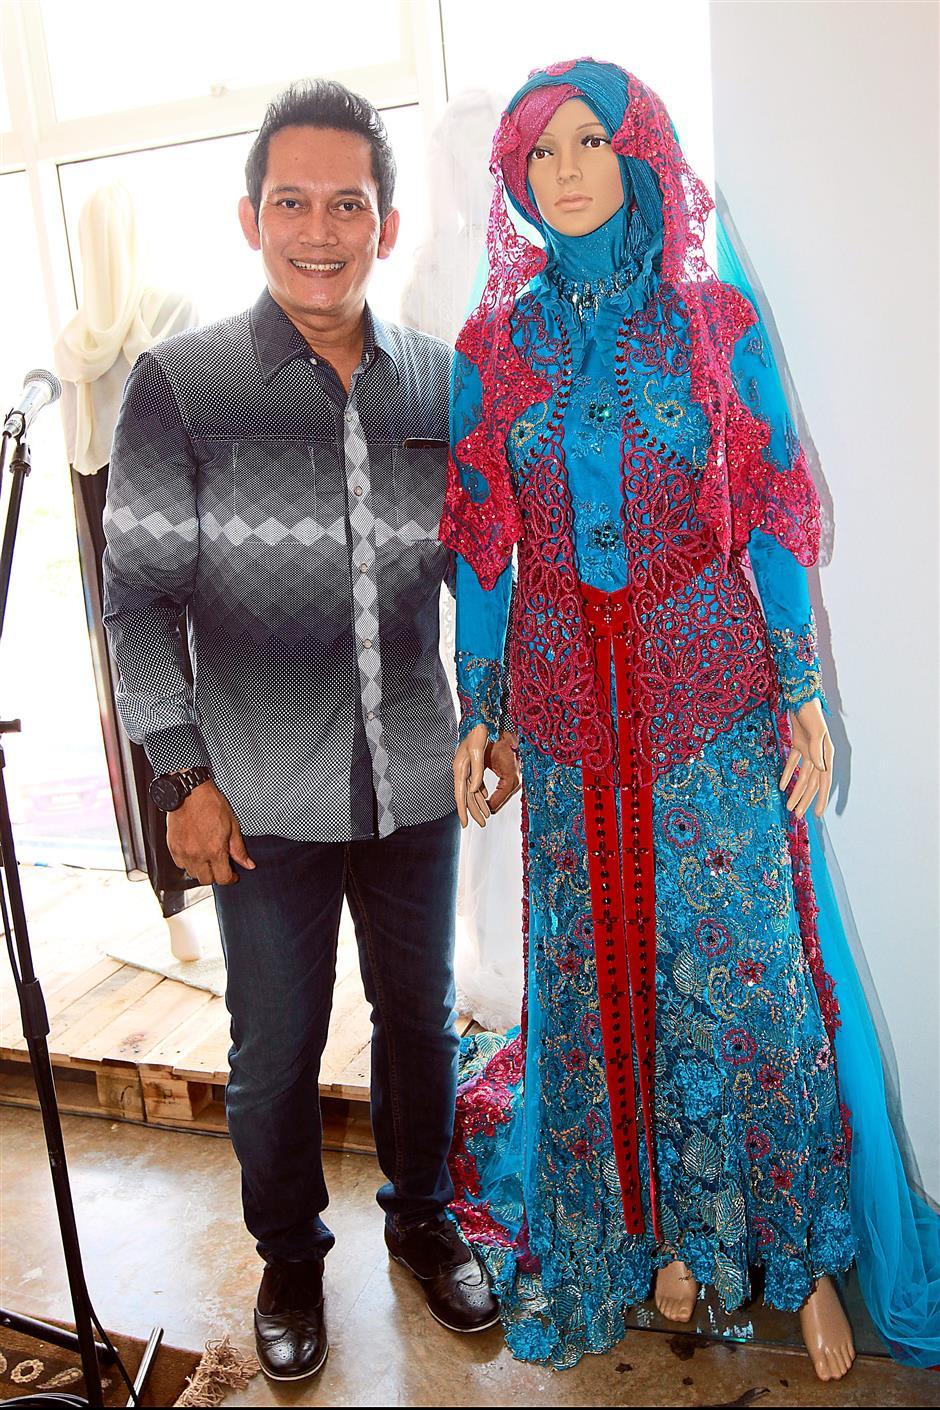 Creative flair: Indonesian designer Toera Imara with one of his designs.